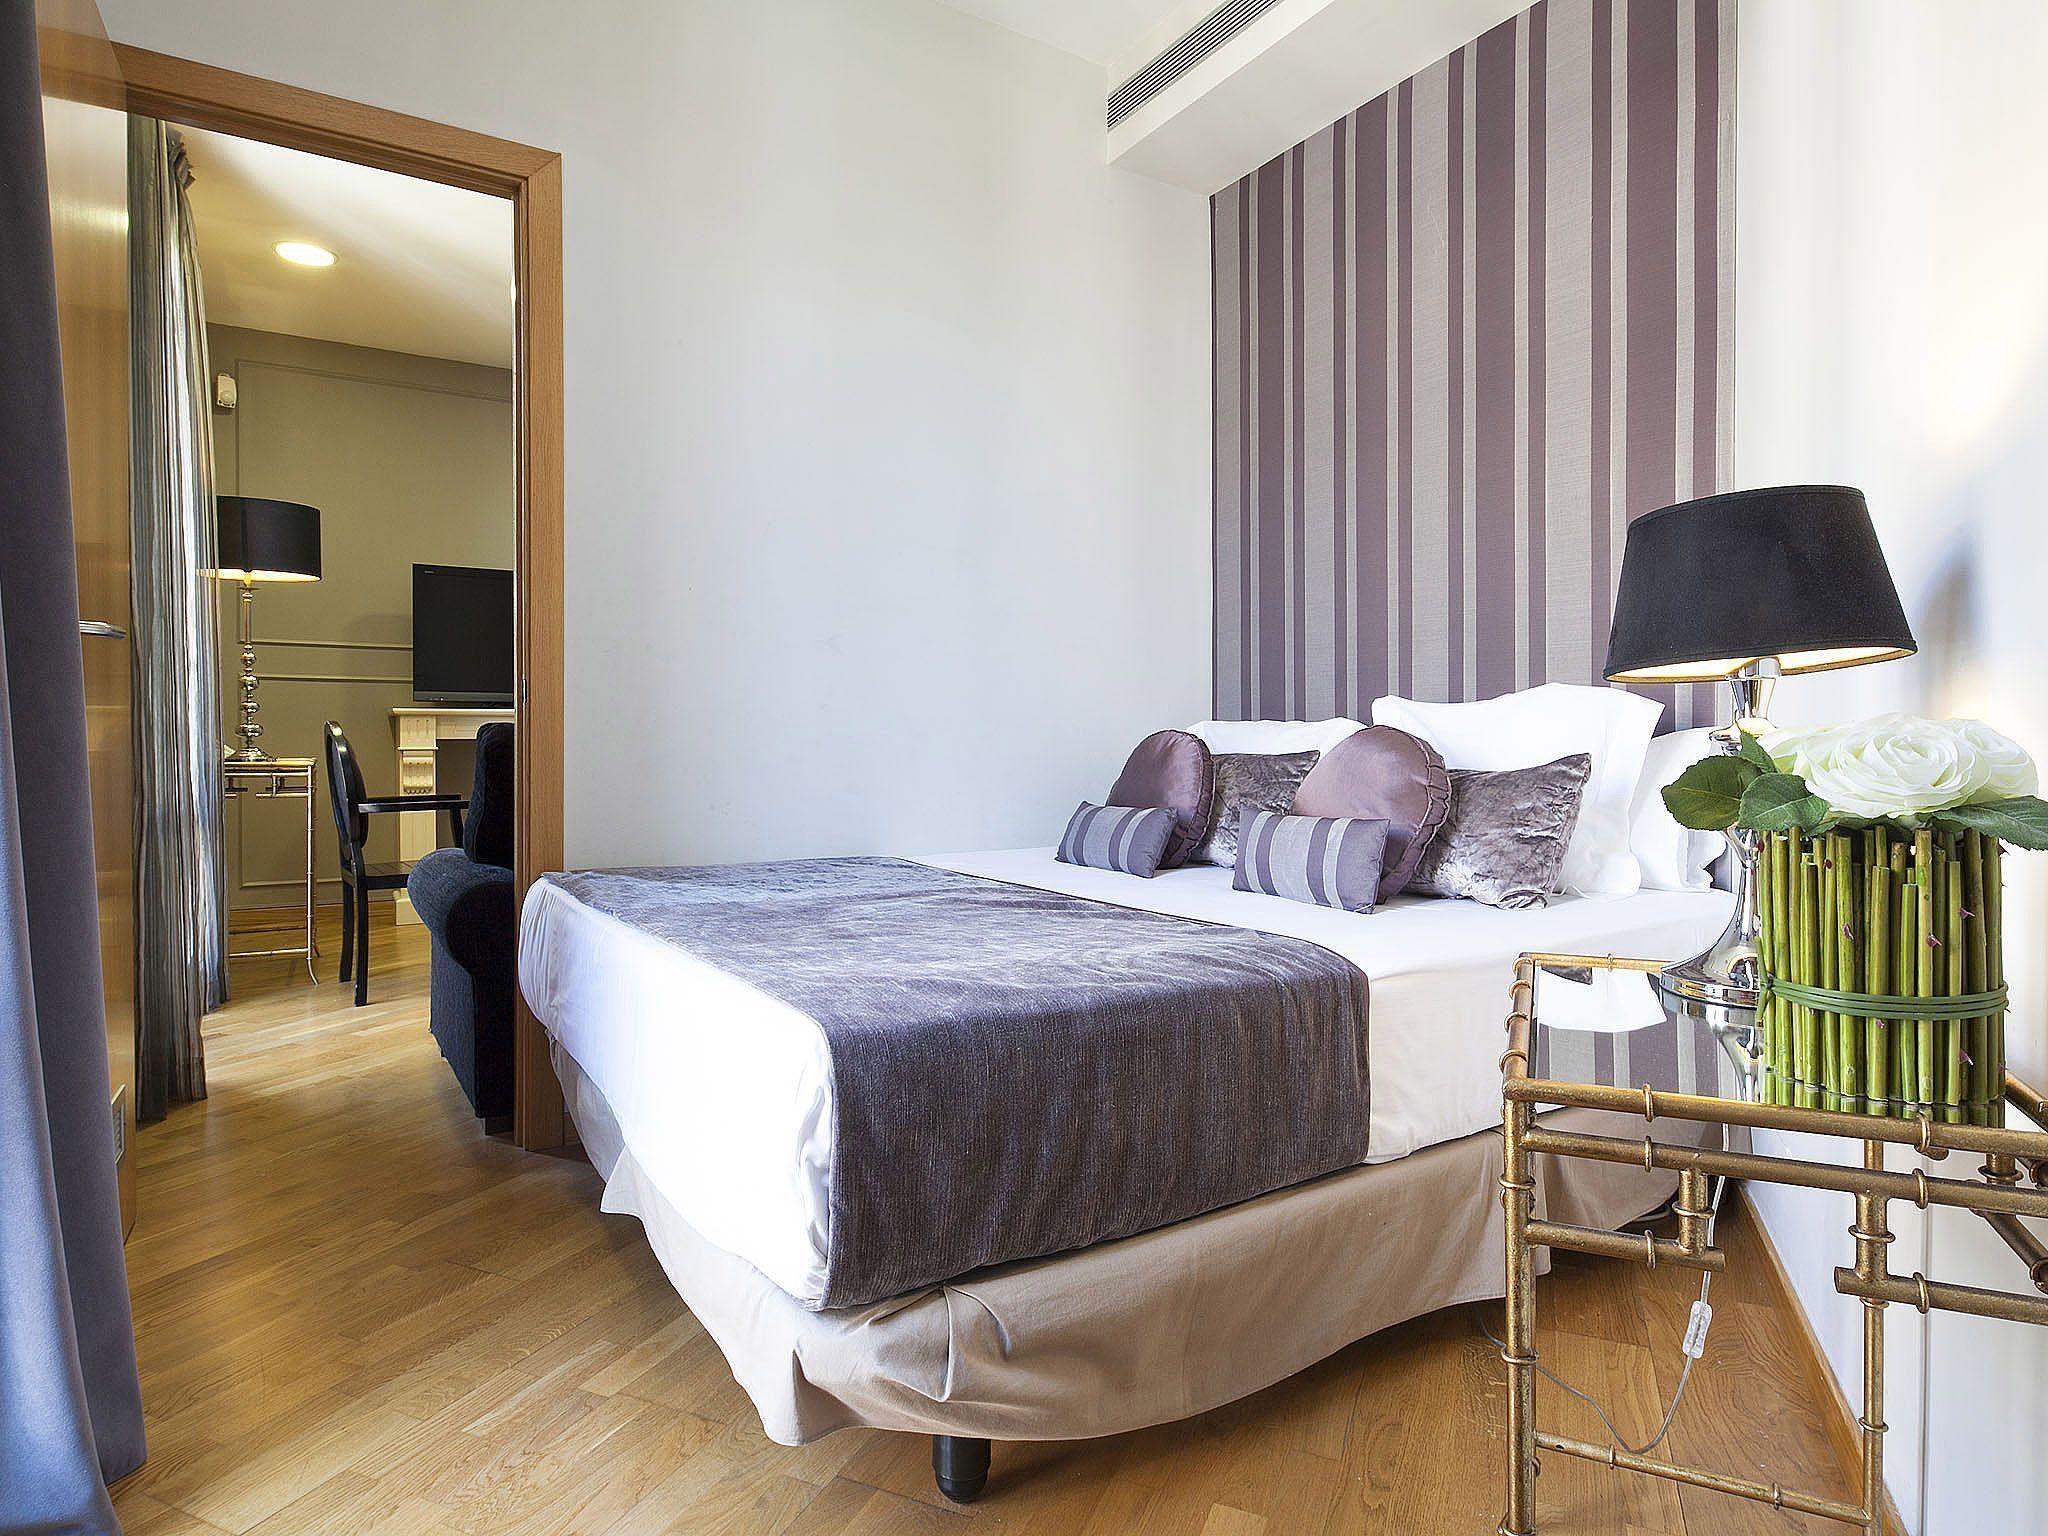 apartamentos-splendom-suites-barcelona-11